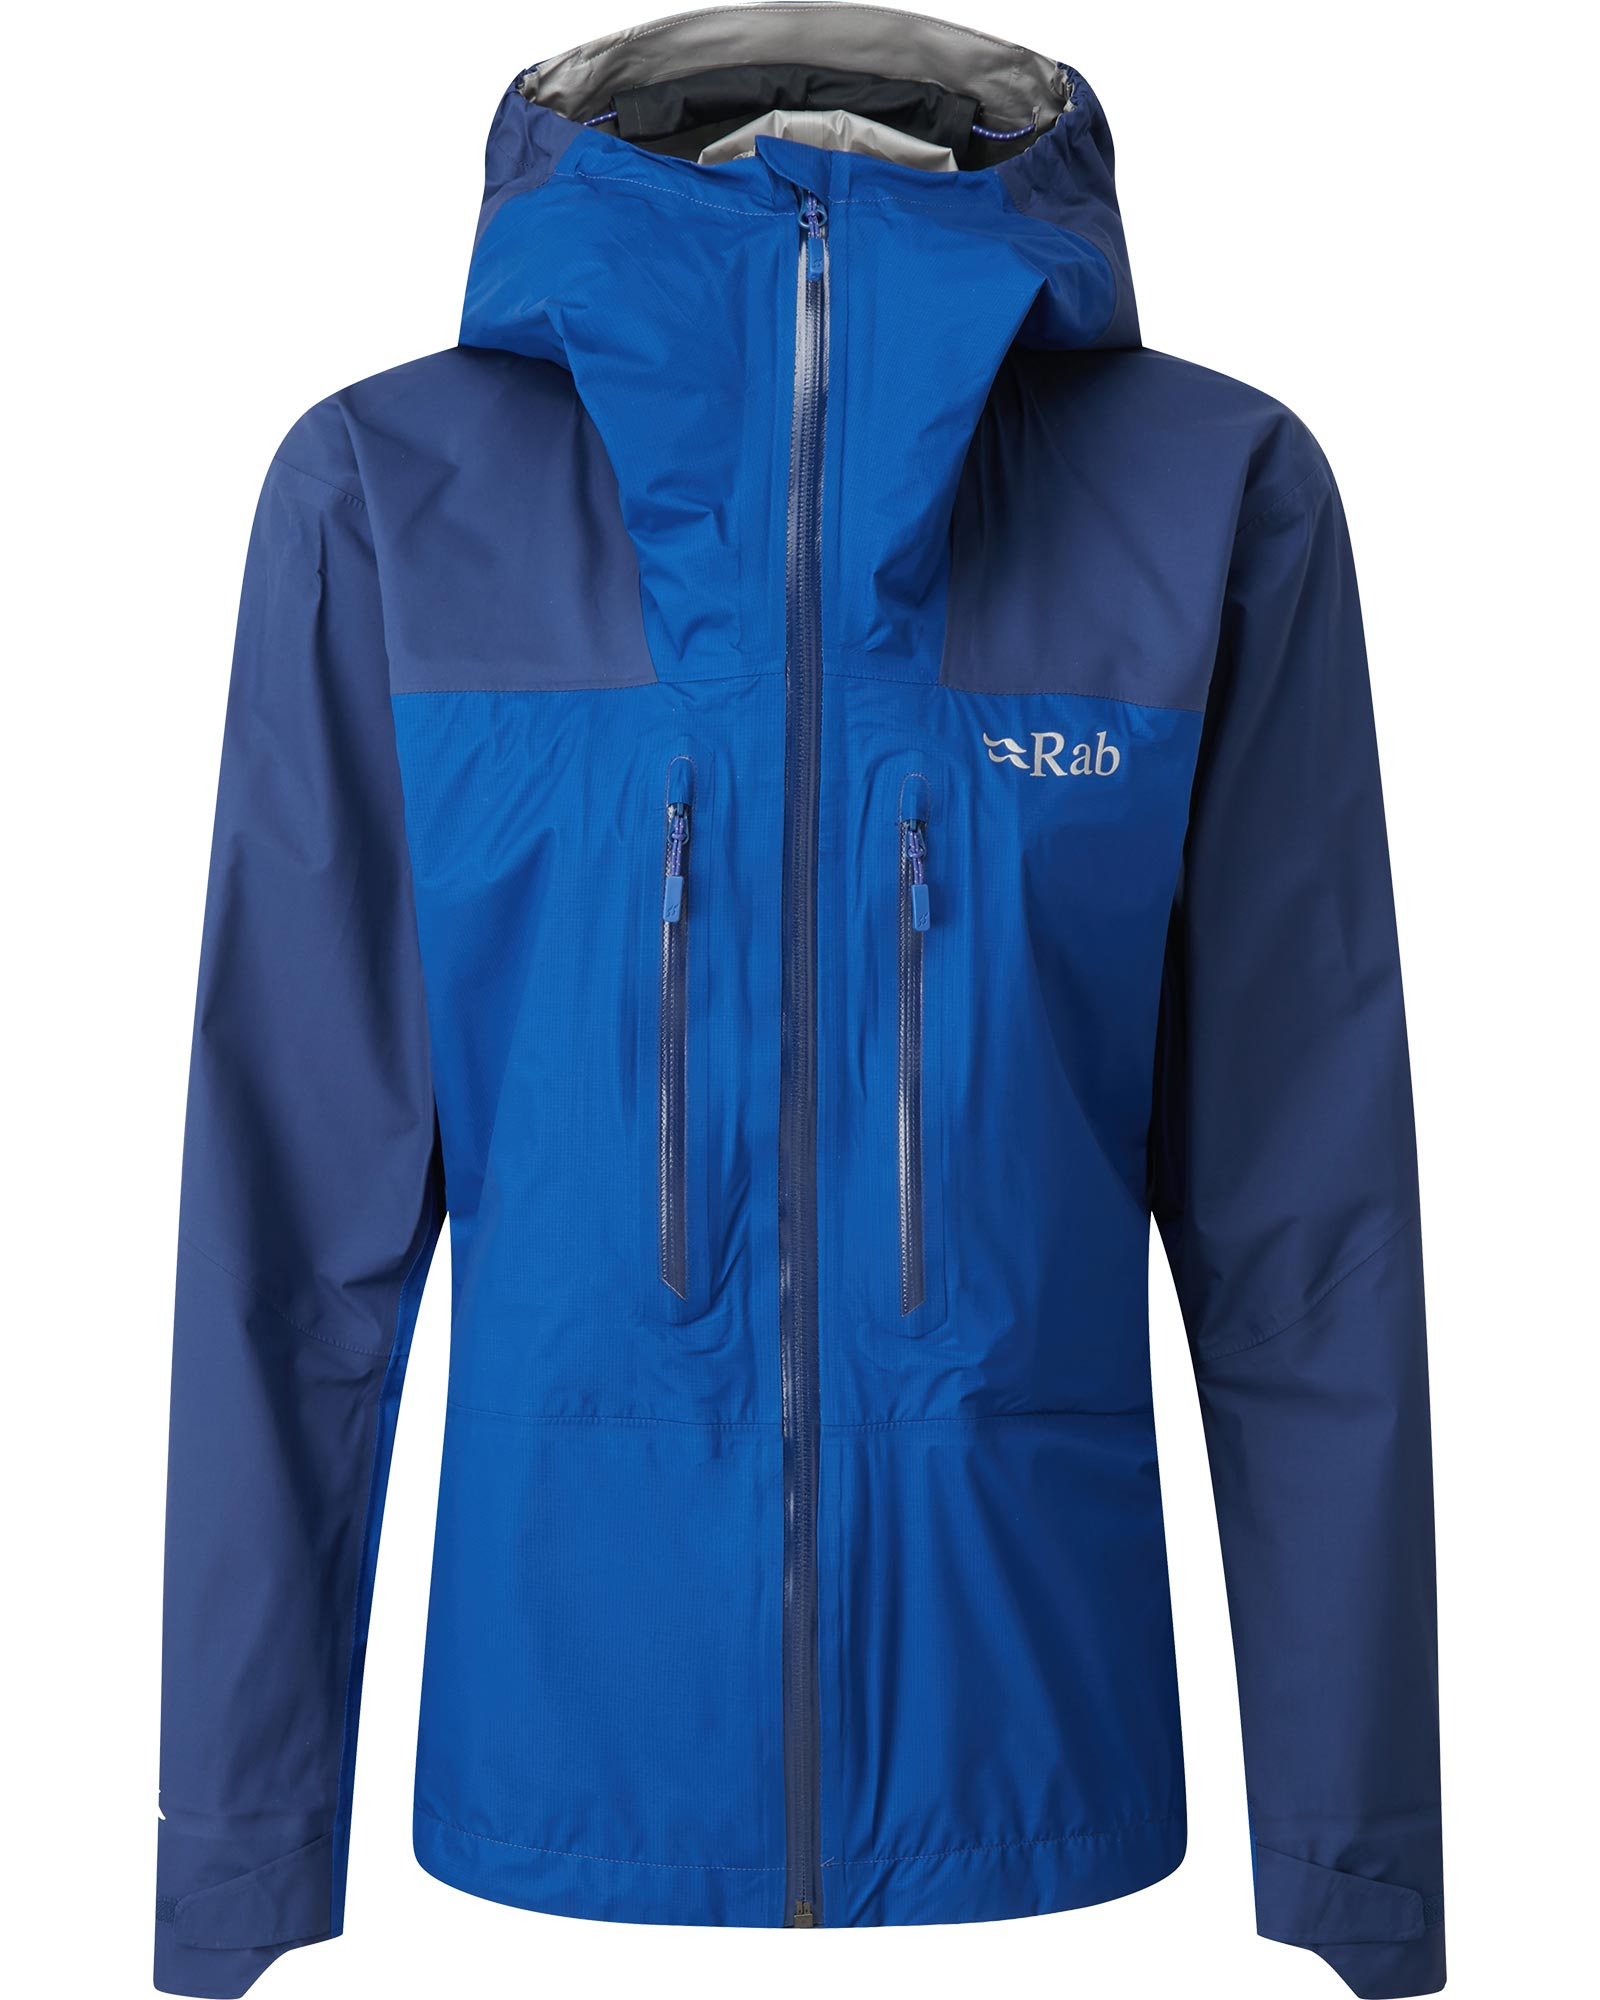 Rab Women's Zenith GORE-TEX PACLITE Plus Jacket 0